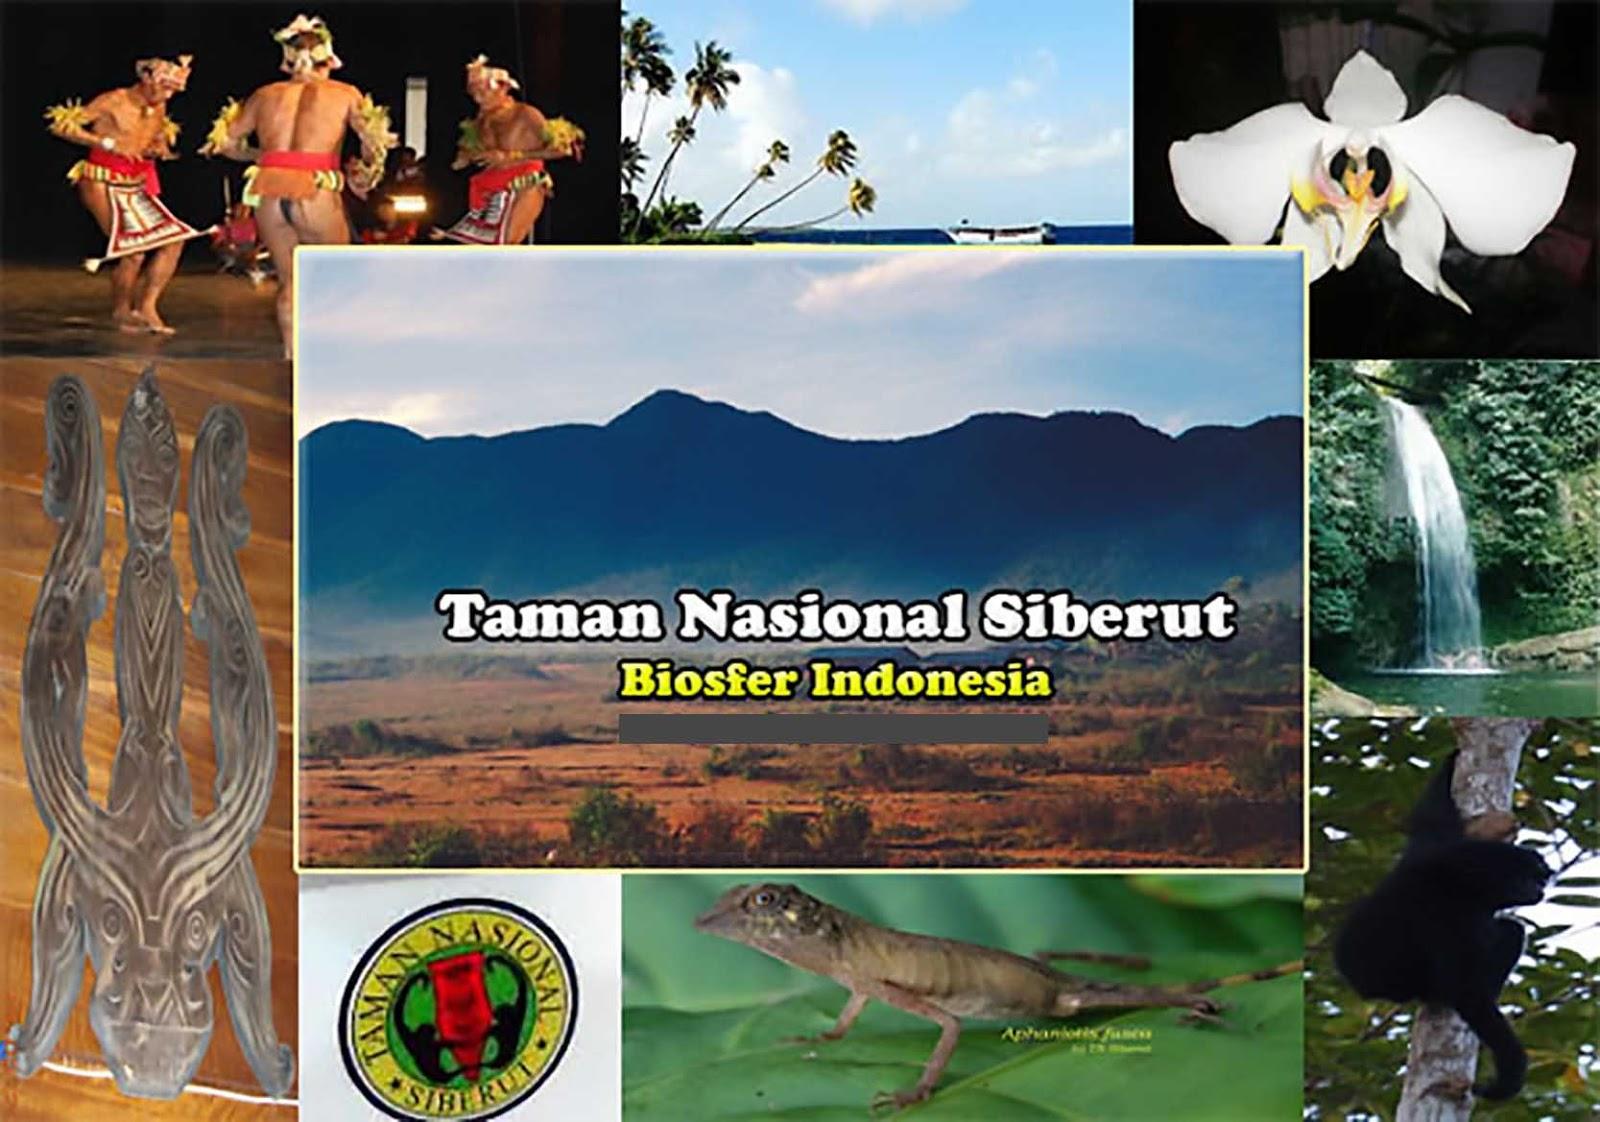 Taman Nasional Siberut Sumatra Barat